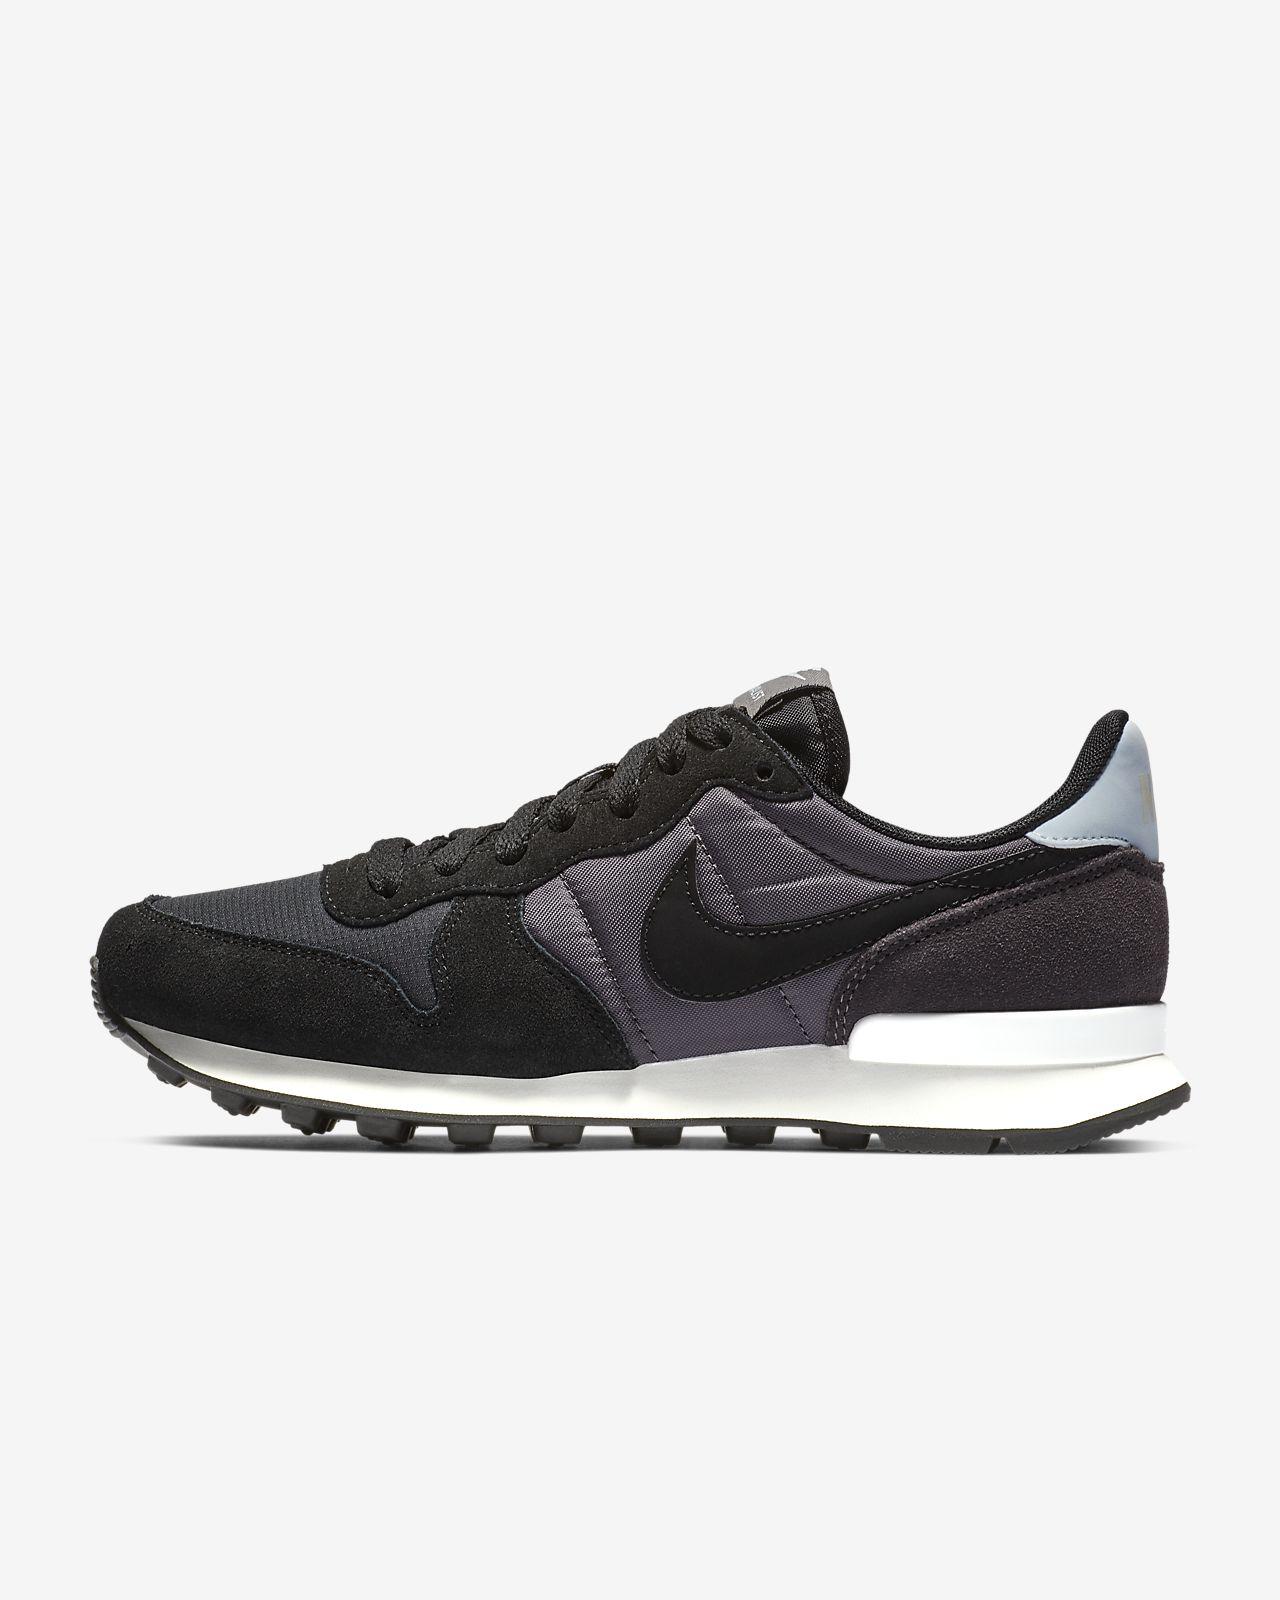 Sapatilhas Nike Internationalist para mulher